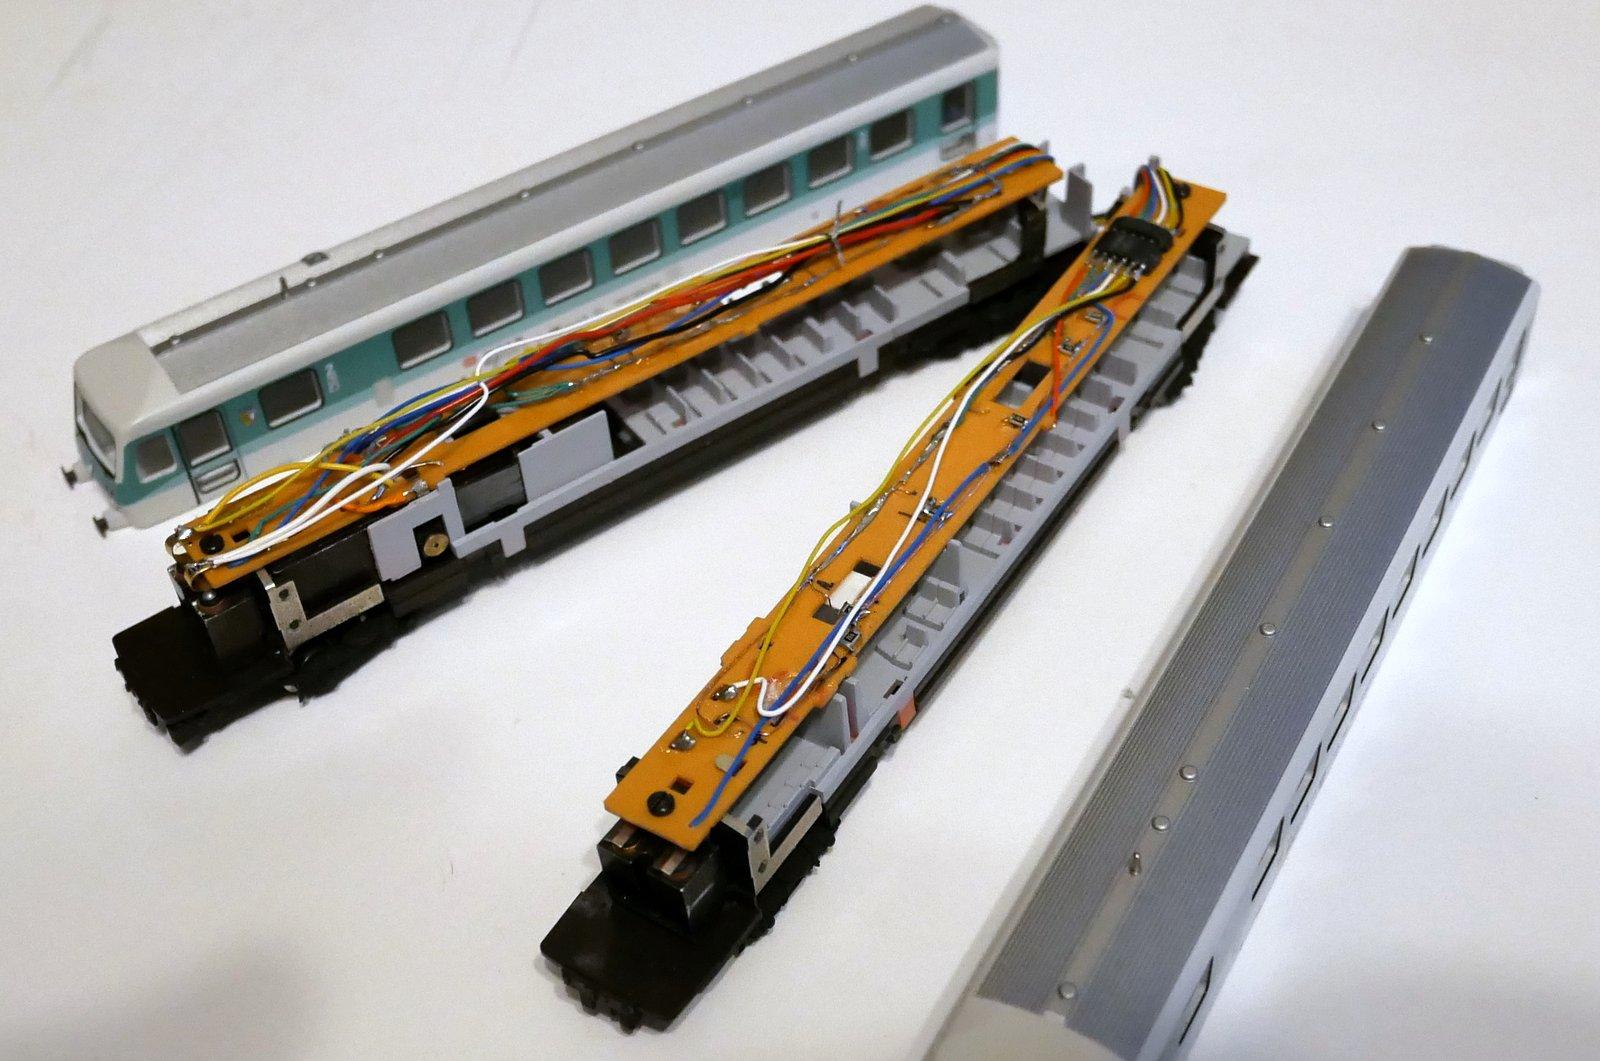 P1140691-001.JPG